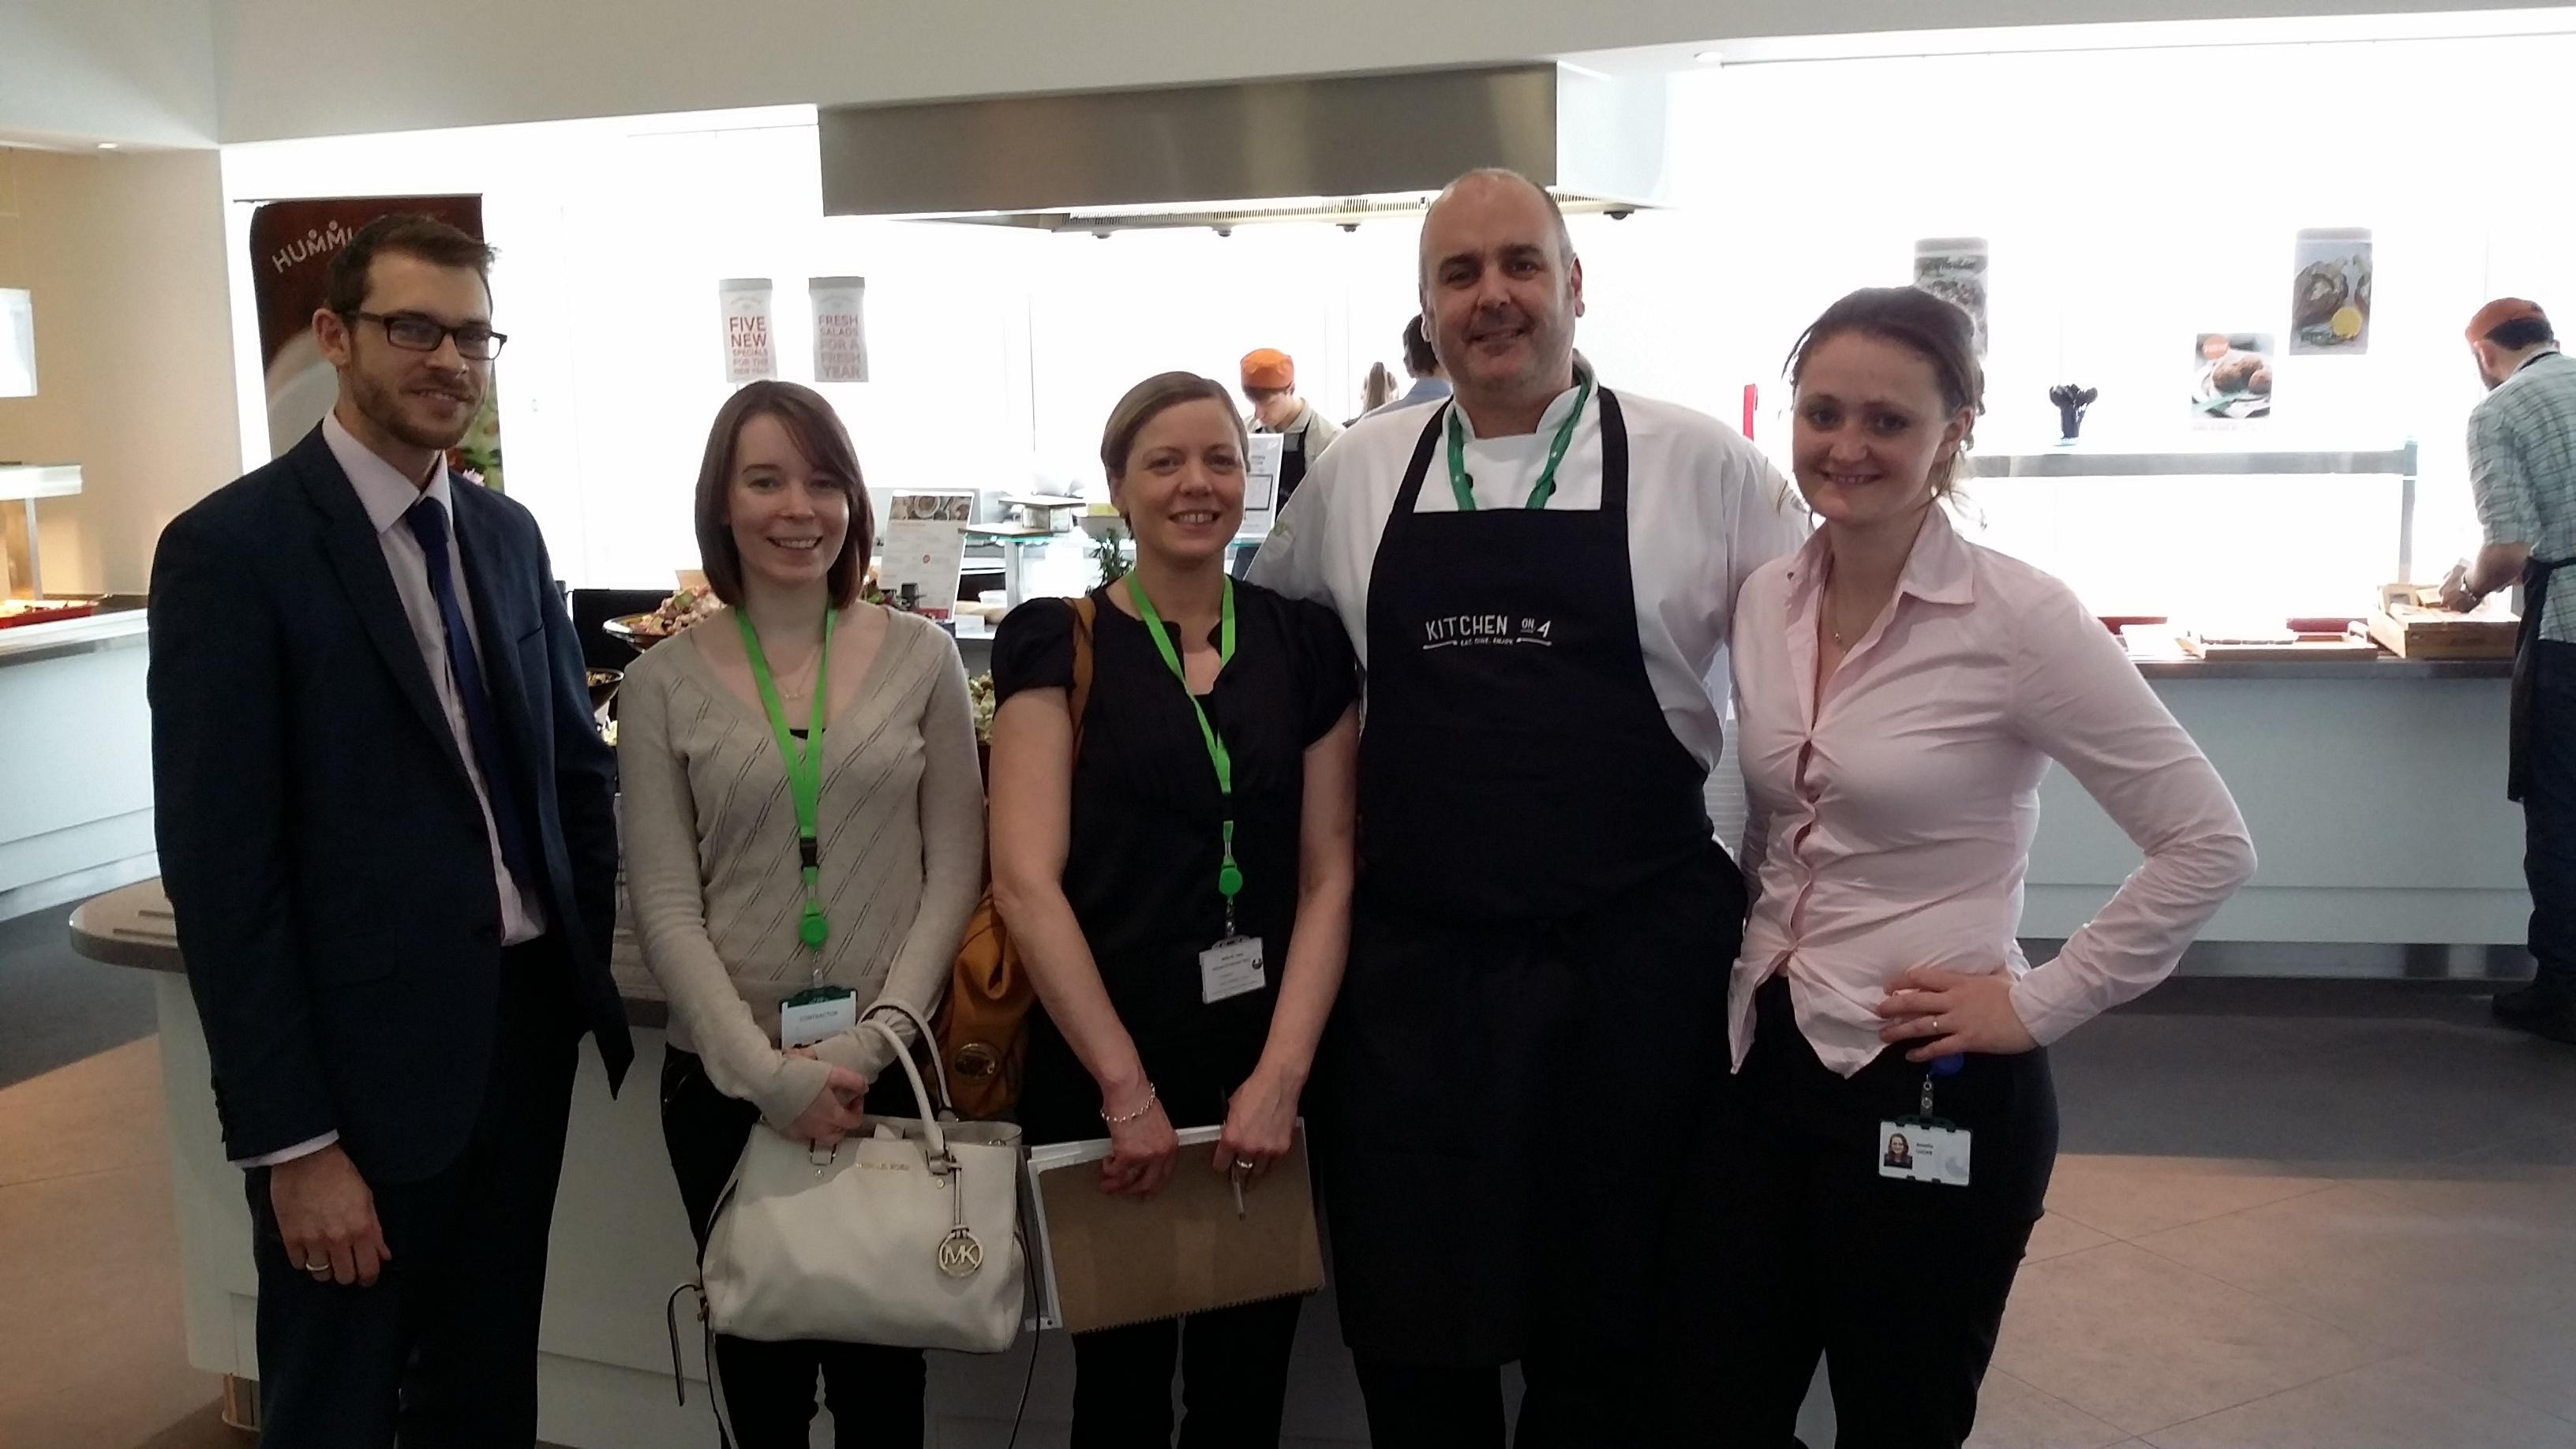 Ed, Jess, Jane, Chef & Amelia